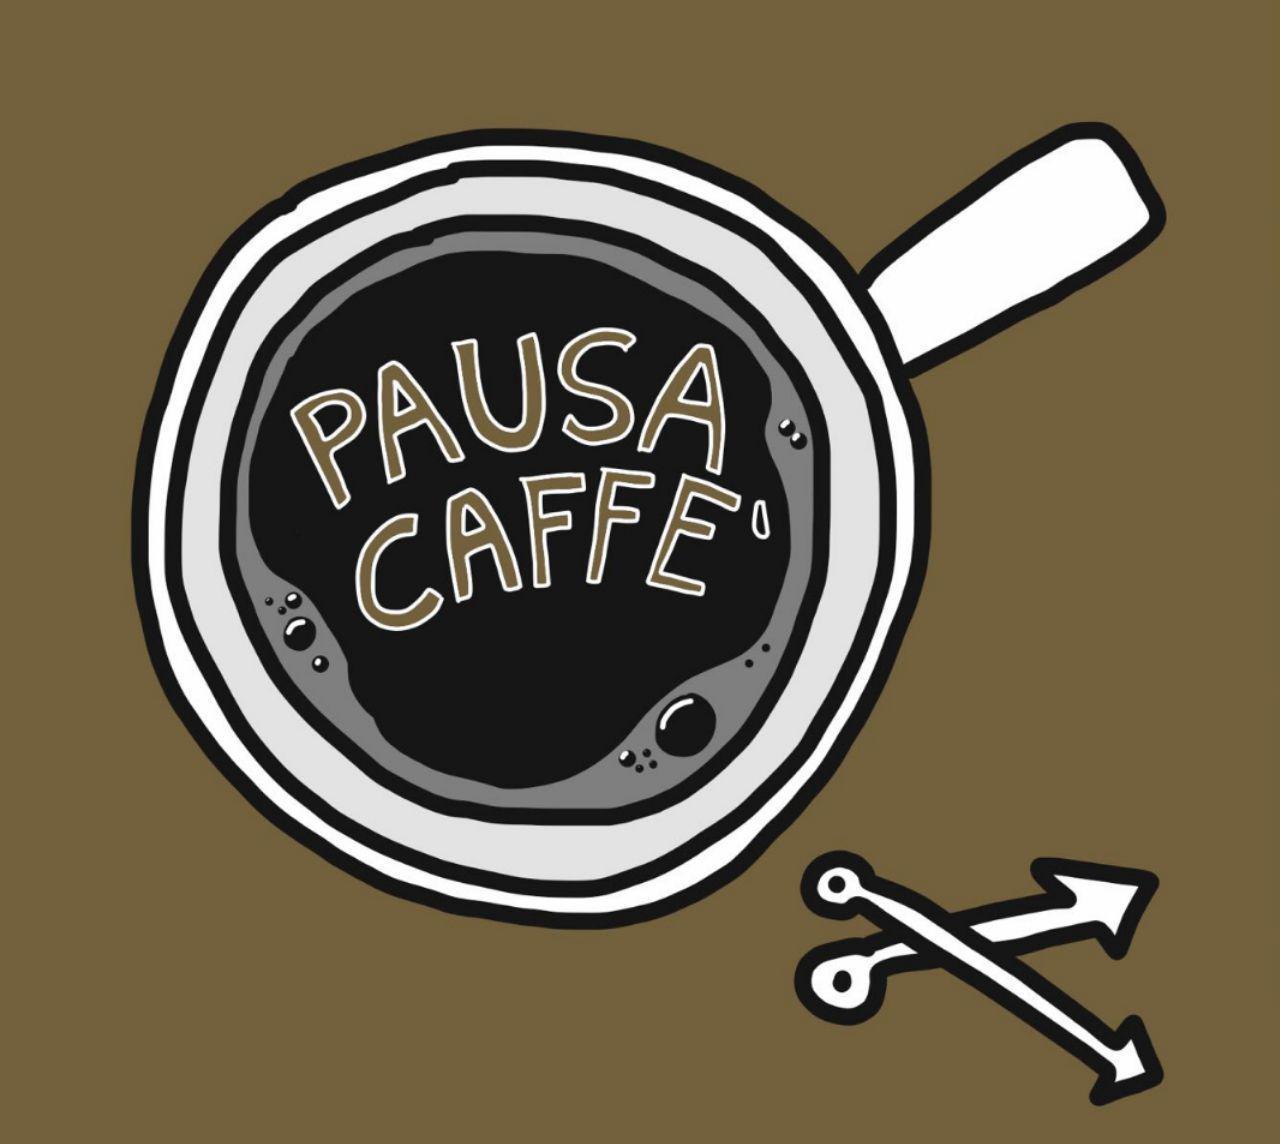 logo una pausa caffè